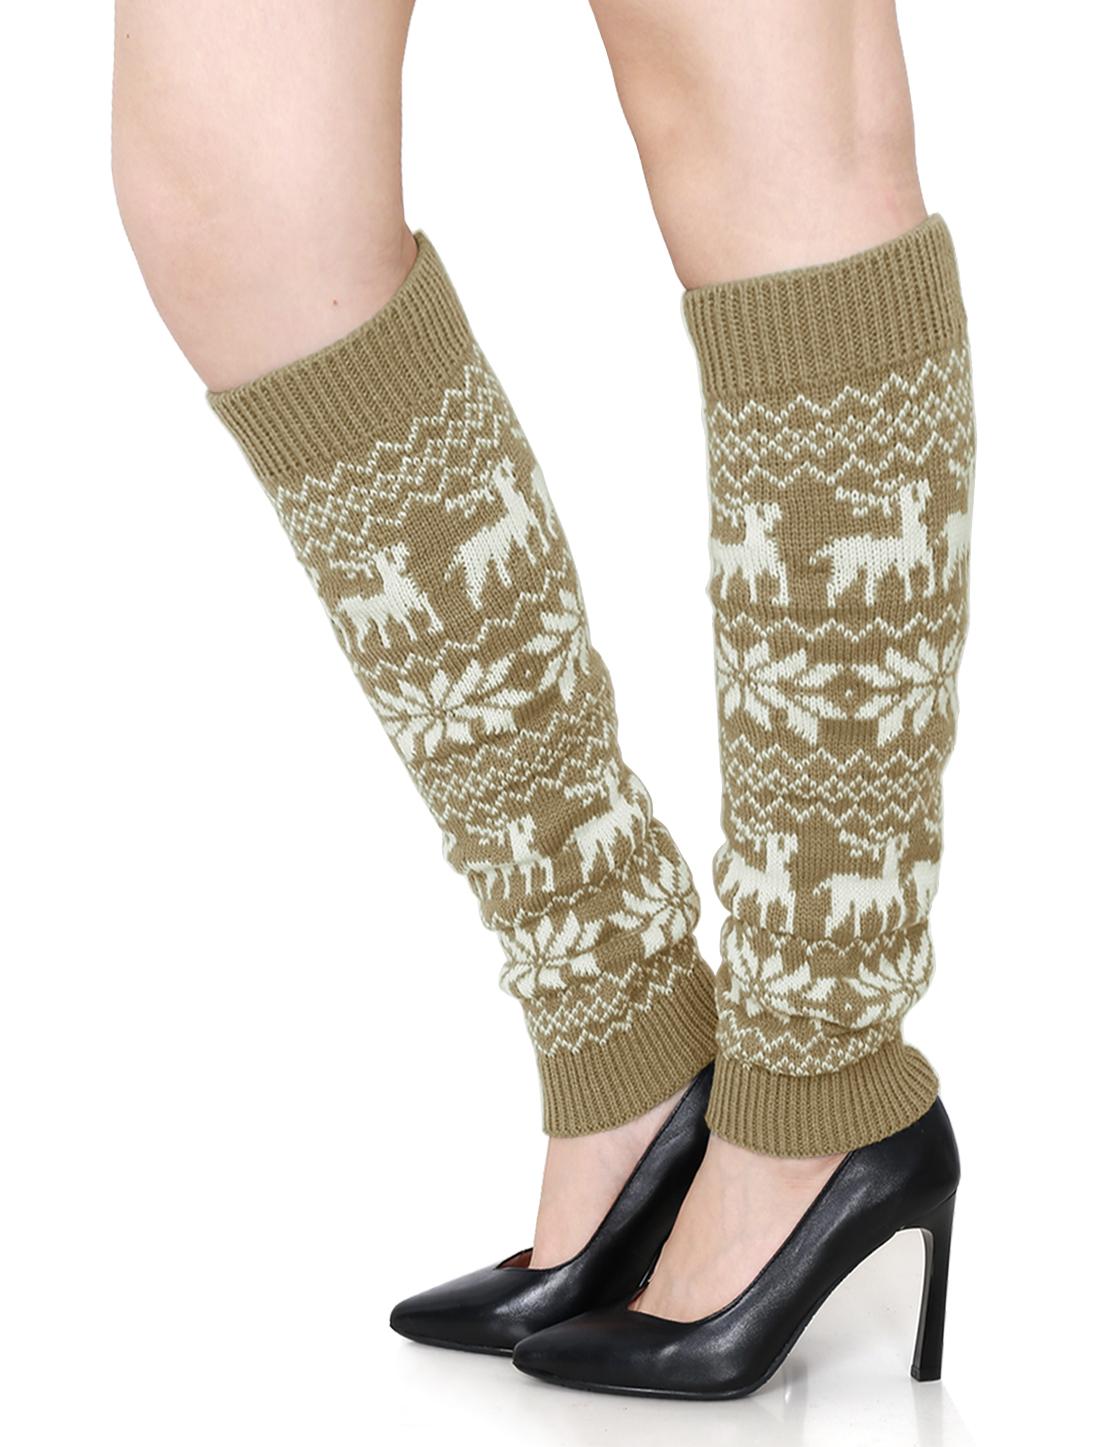 Women Elastic Cuffs Snowflake Deers Pattern Knit Leg Warmers Pair Beige White